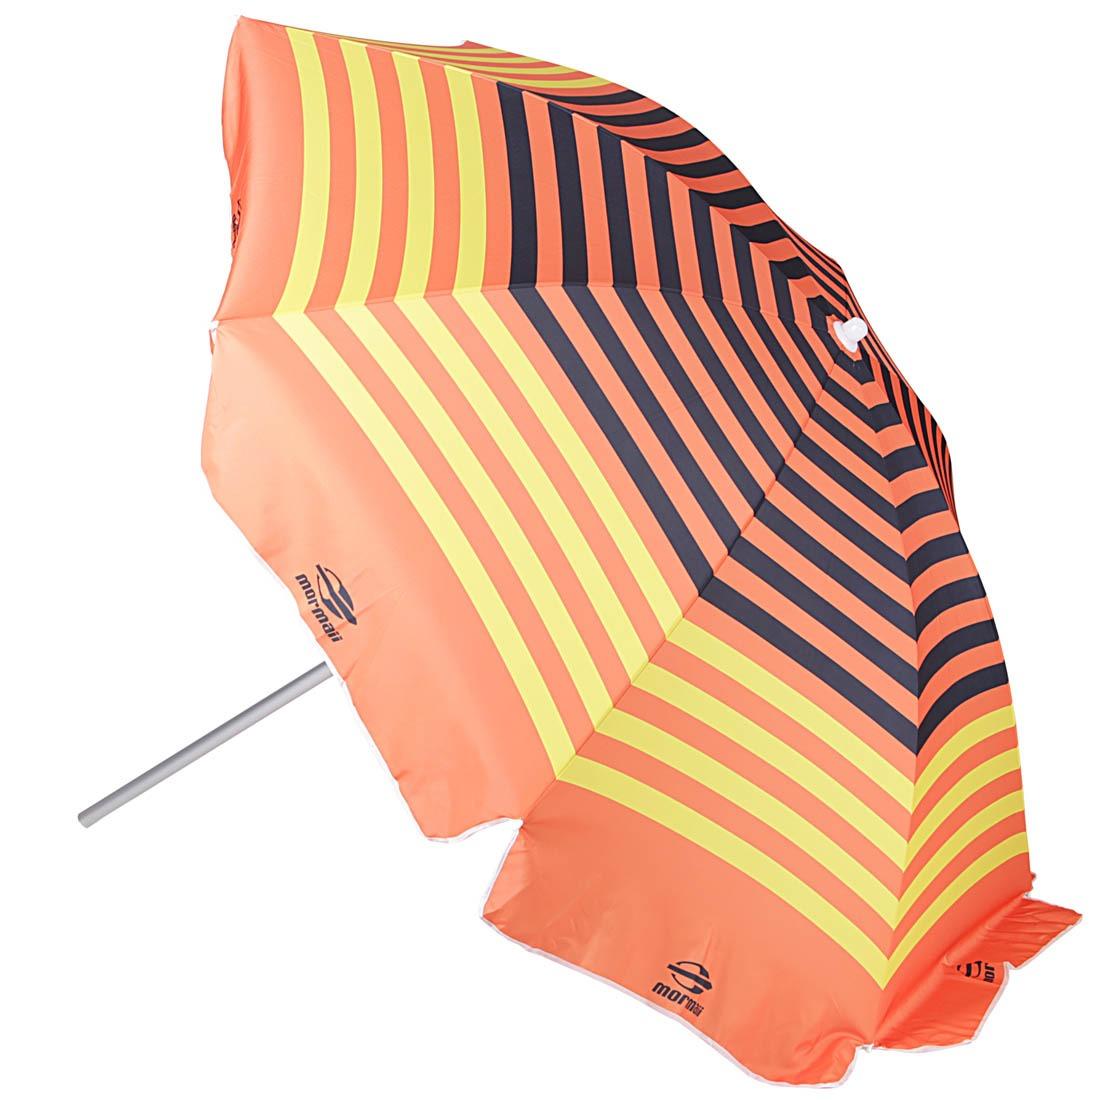 5d30106f24e3c Guarda Sol 220cm Preto laranja - Mormaii - R  129,90 em Mercado Livre